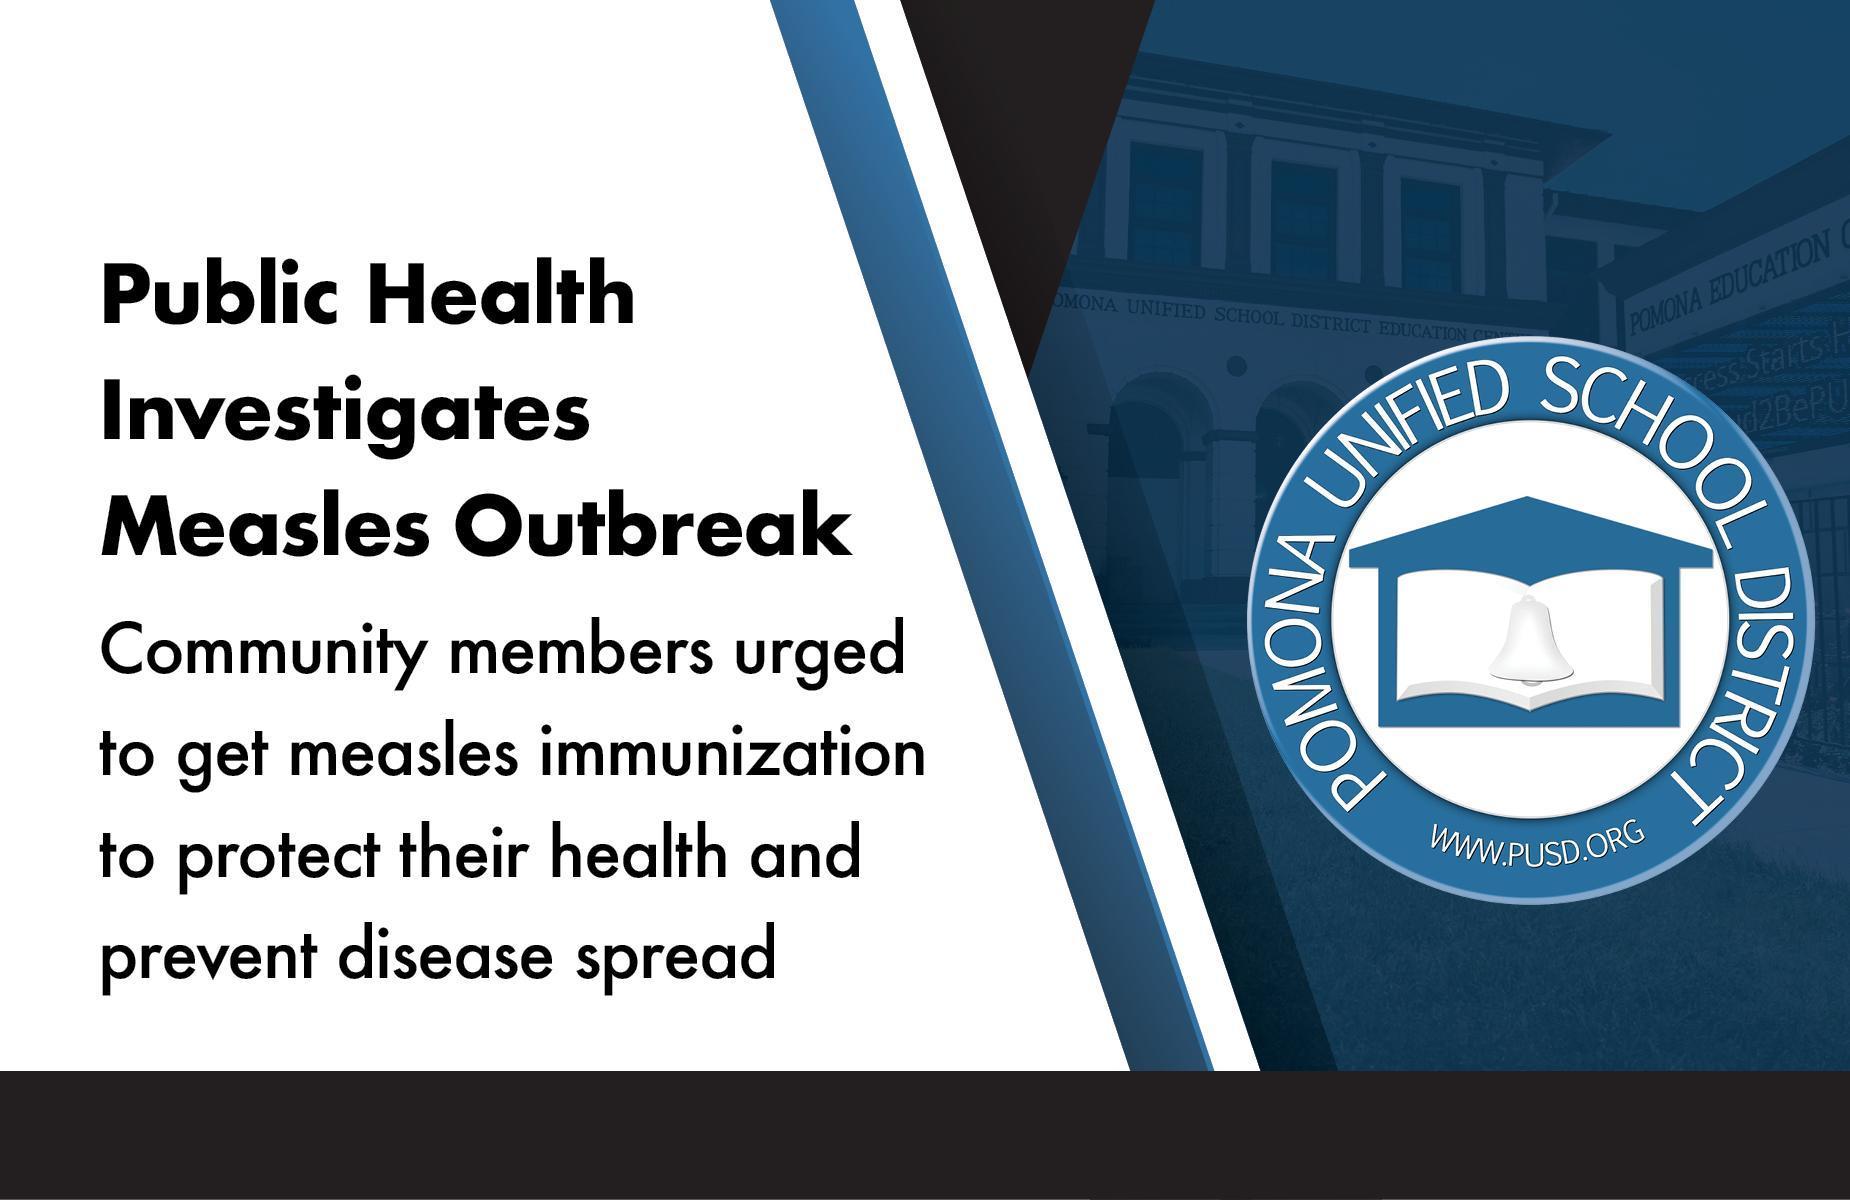 Public Health Investigates Measles Outbreak